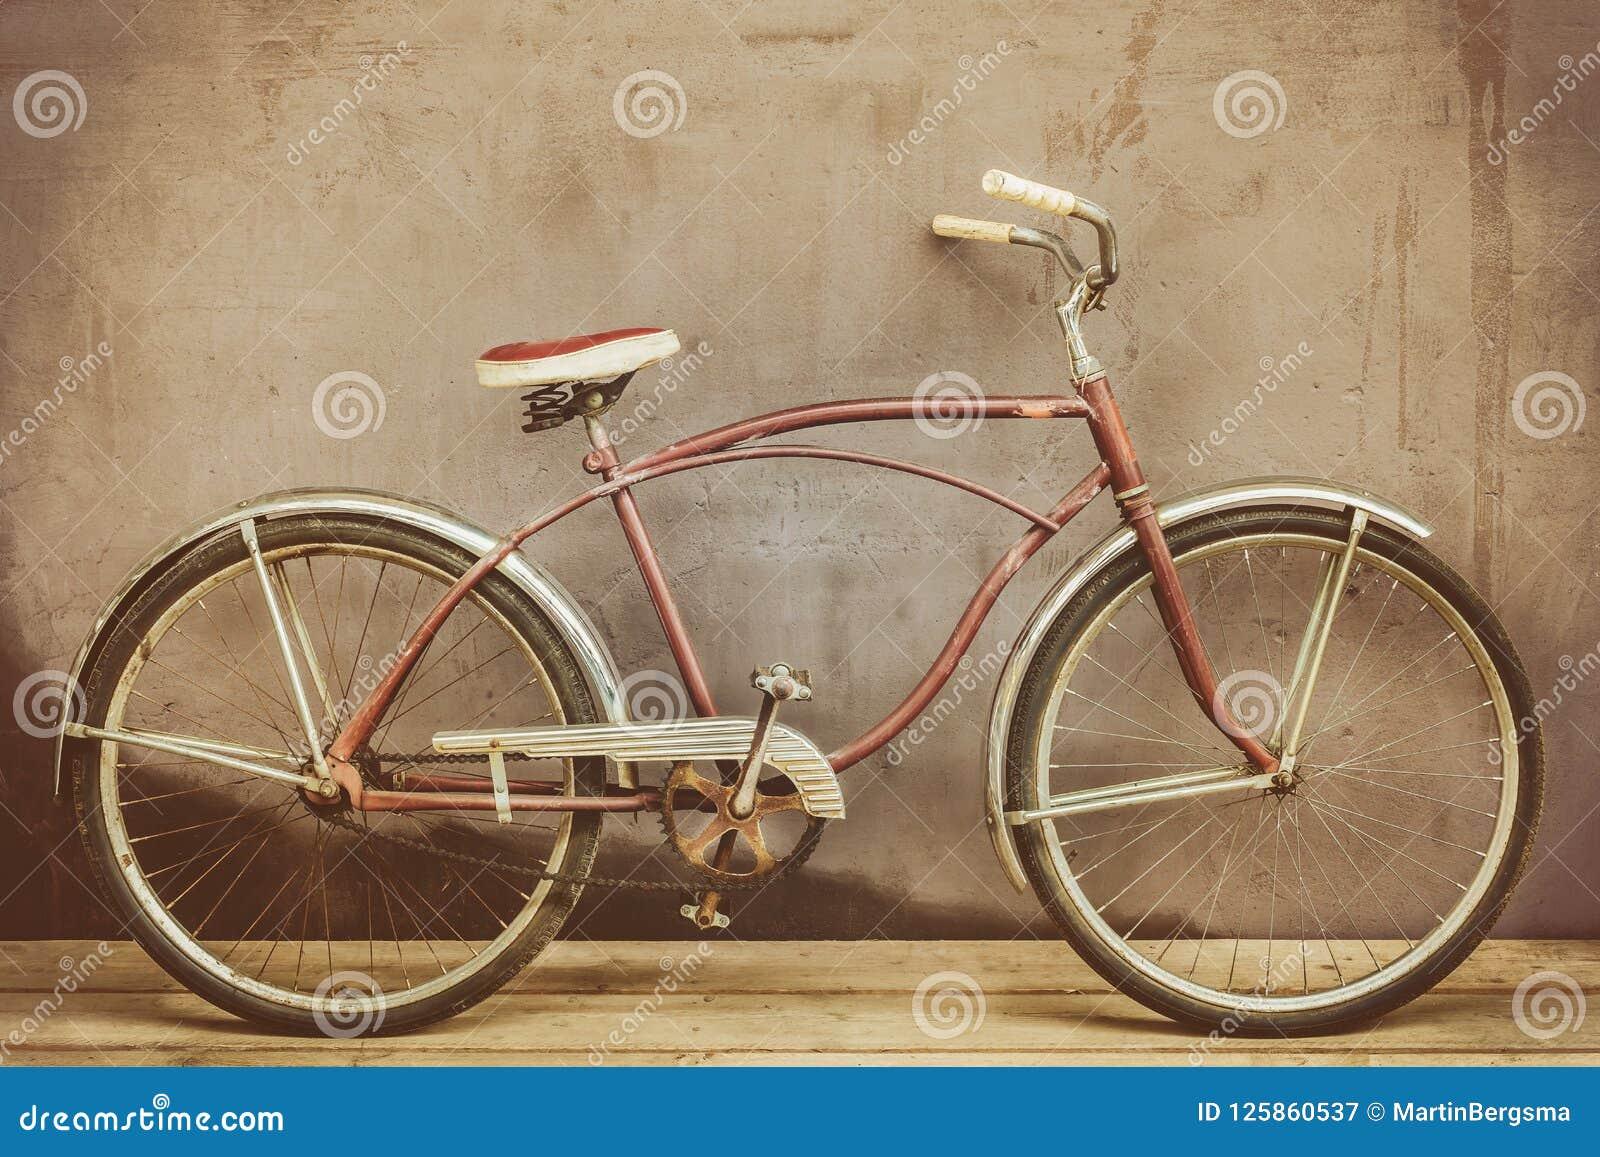 El vintage aherrumbró bicicleta del crucero en un piso de madera